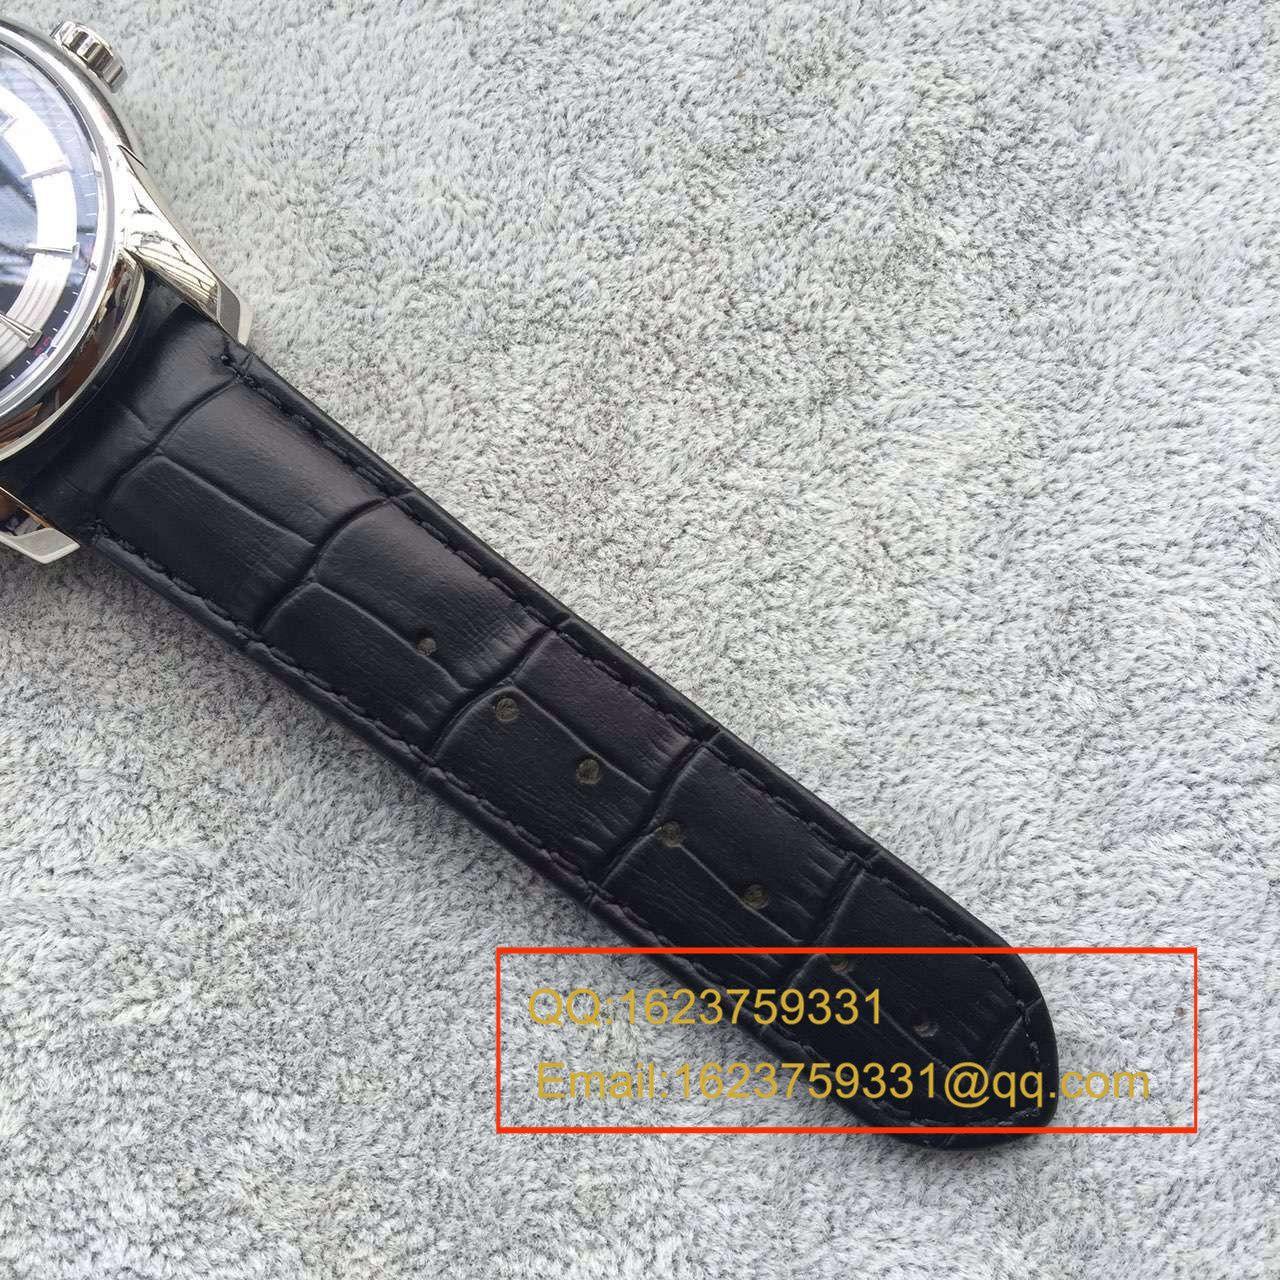 【HBBV6厂超A精仿手表】欧米茄碟飞系列《 HOUR VISION腕表系列》431.33.41.21.01.001腕表 / M205